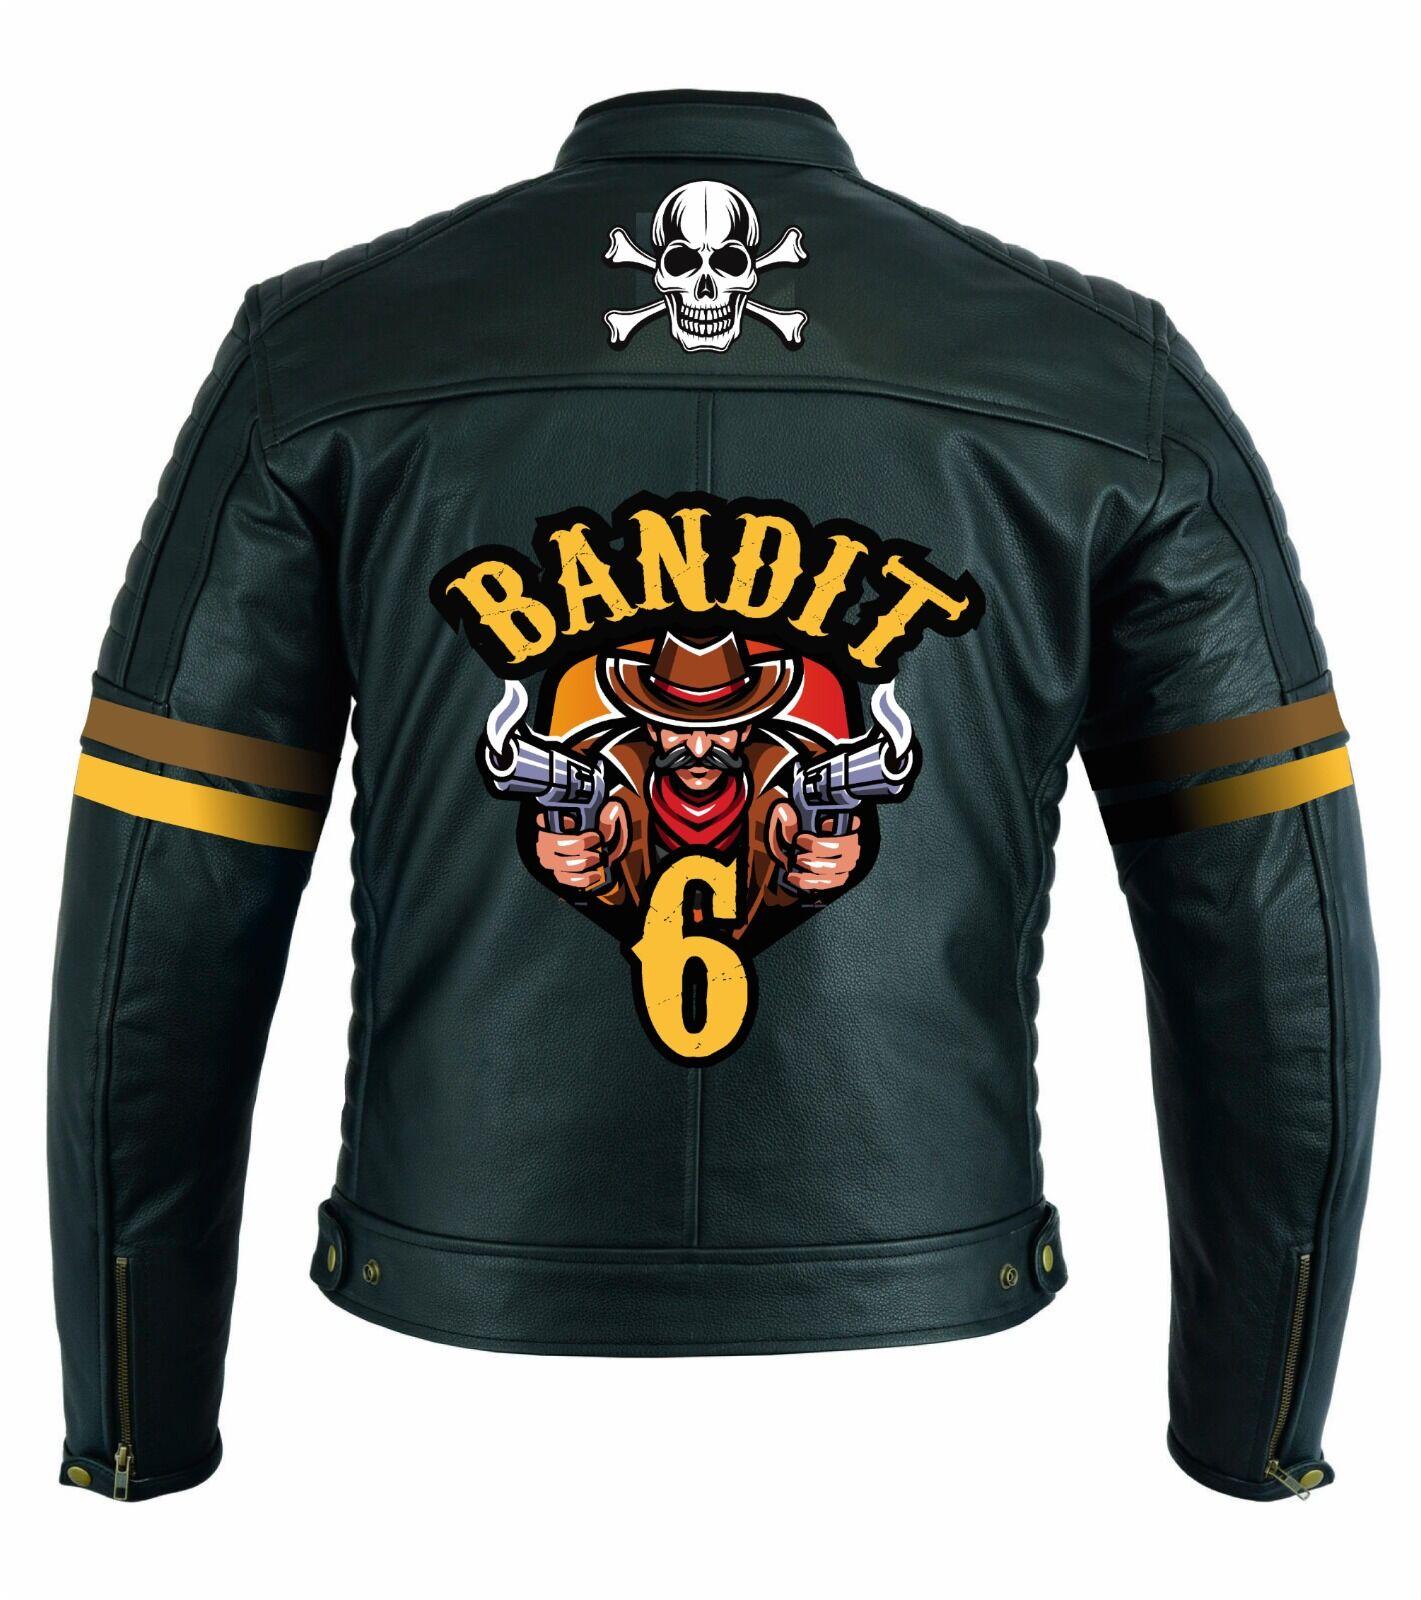 Custom Bandit Jacket